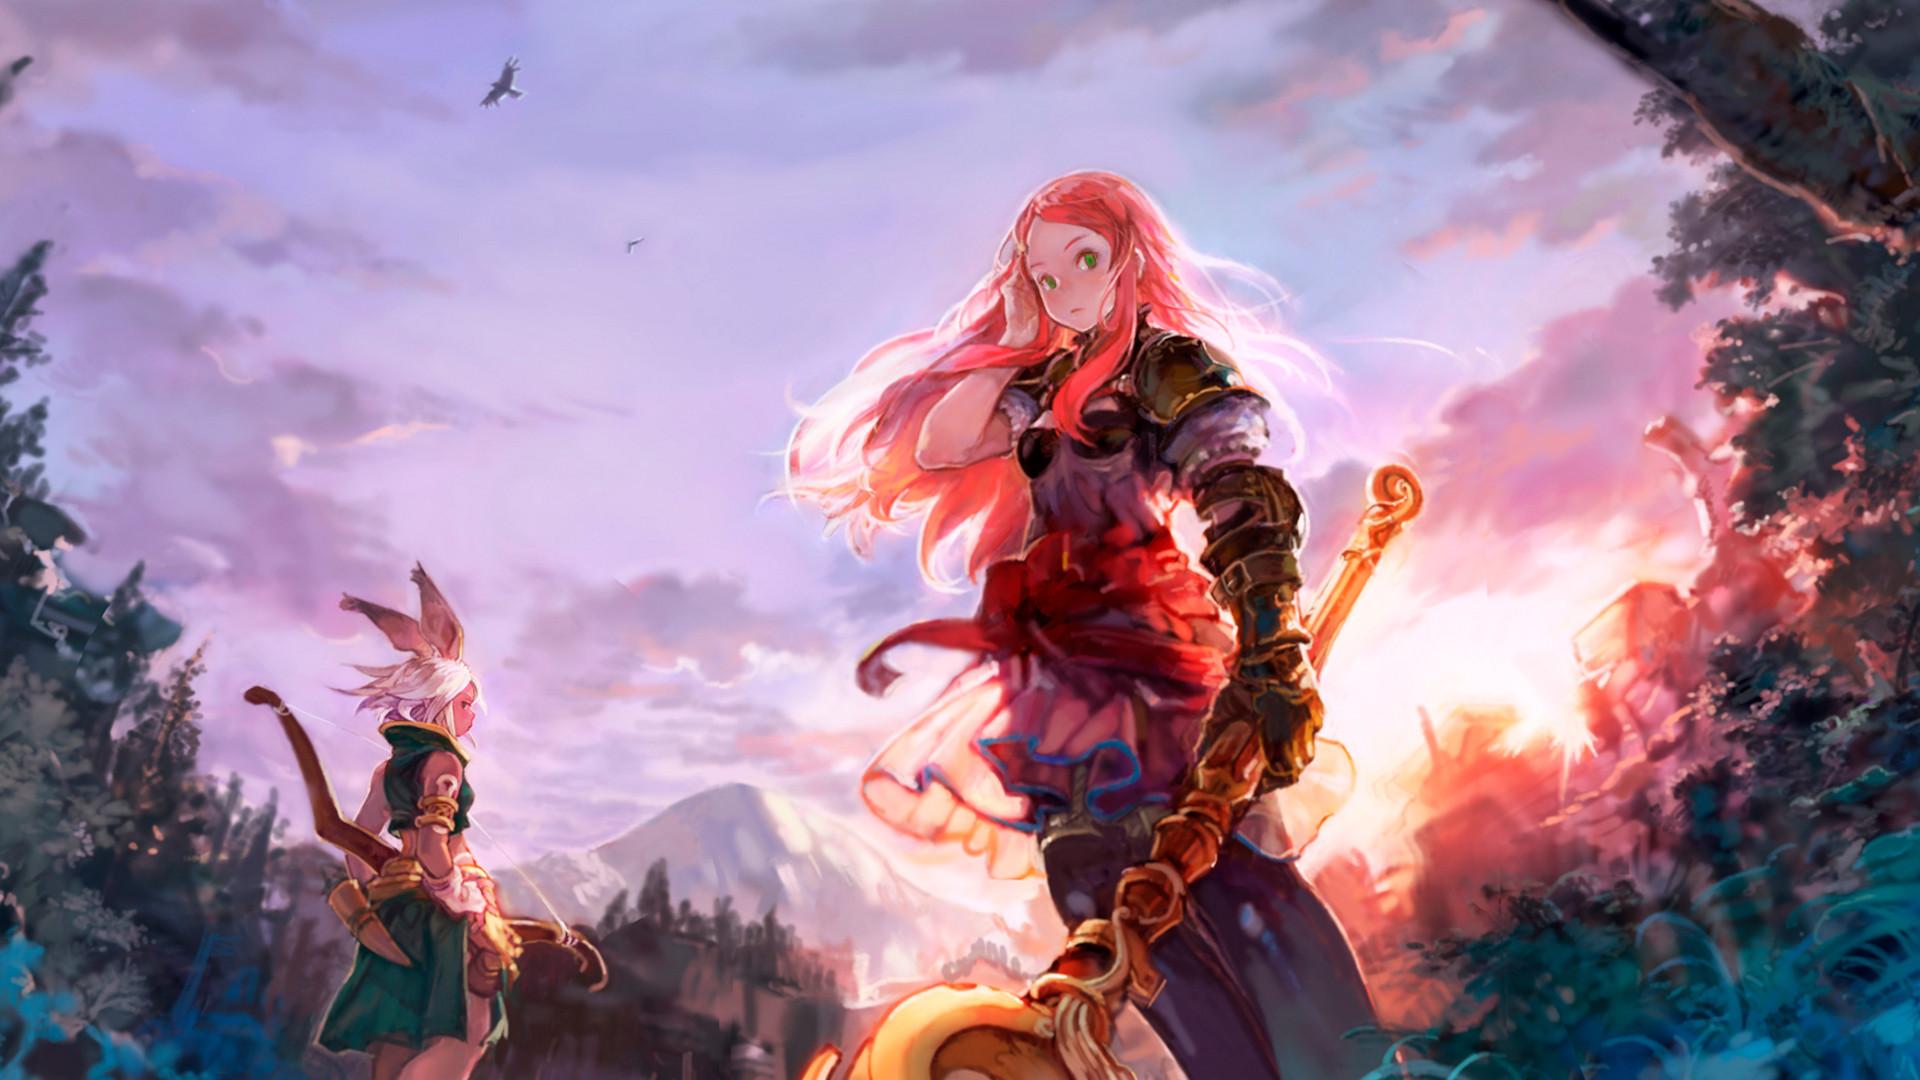 Final fantasy backgrounds 66 images - Final fantasy phone wallpaper ...